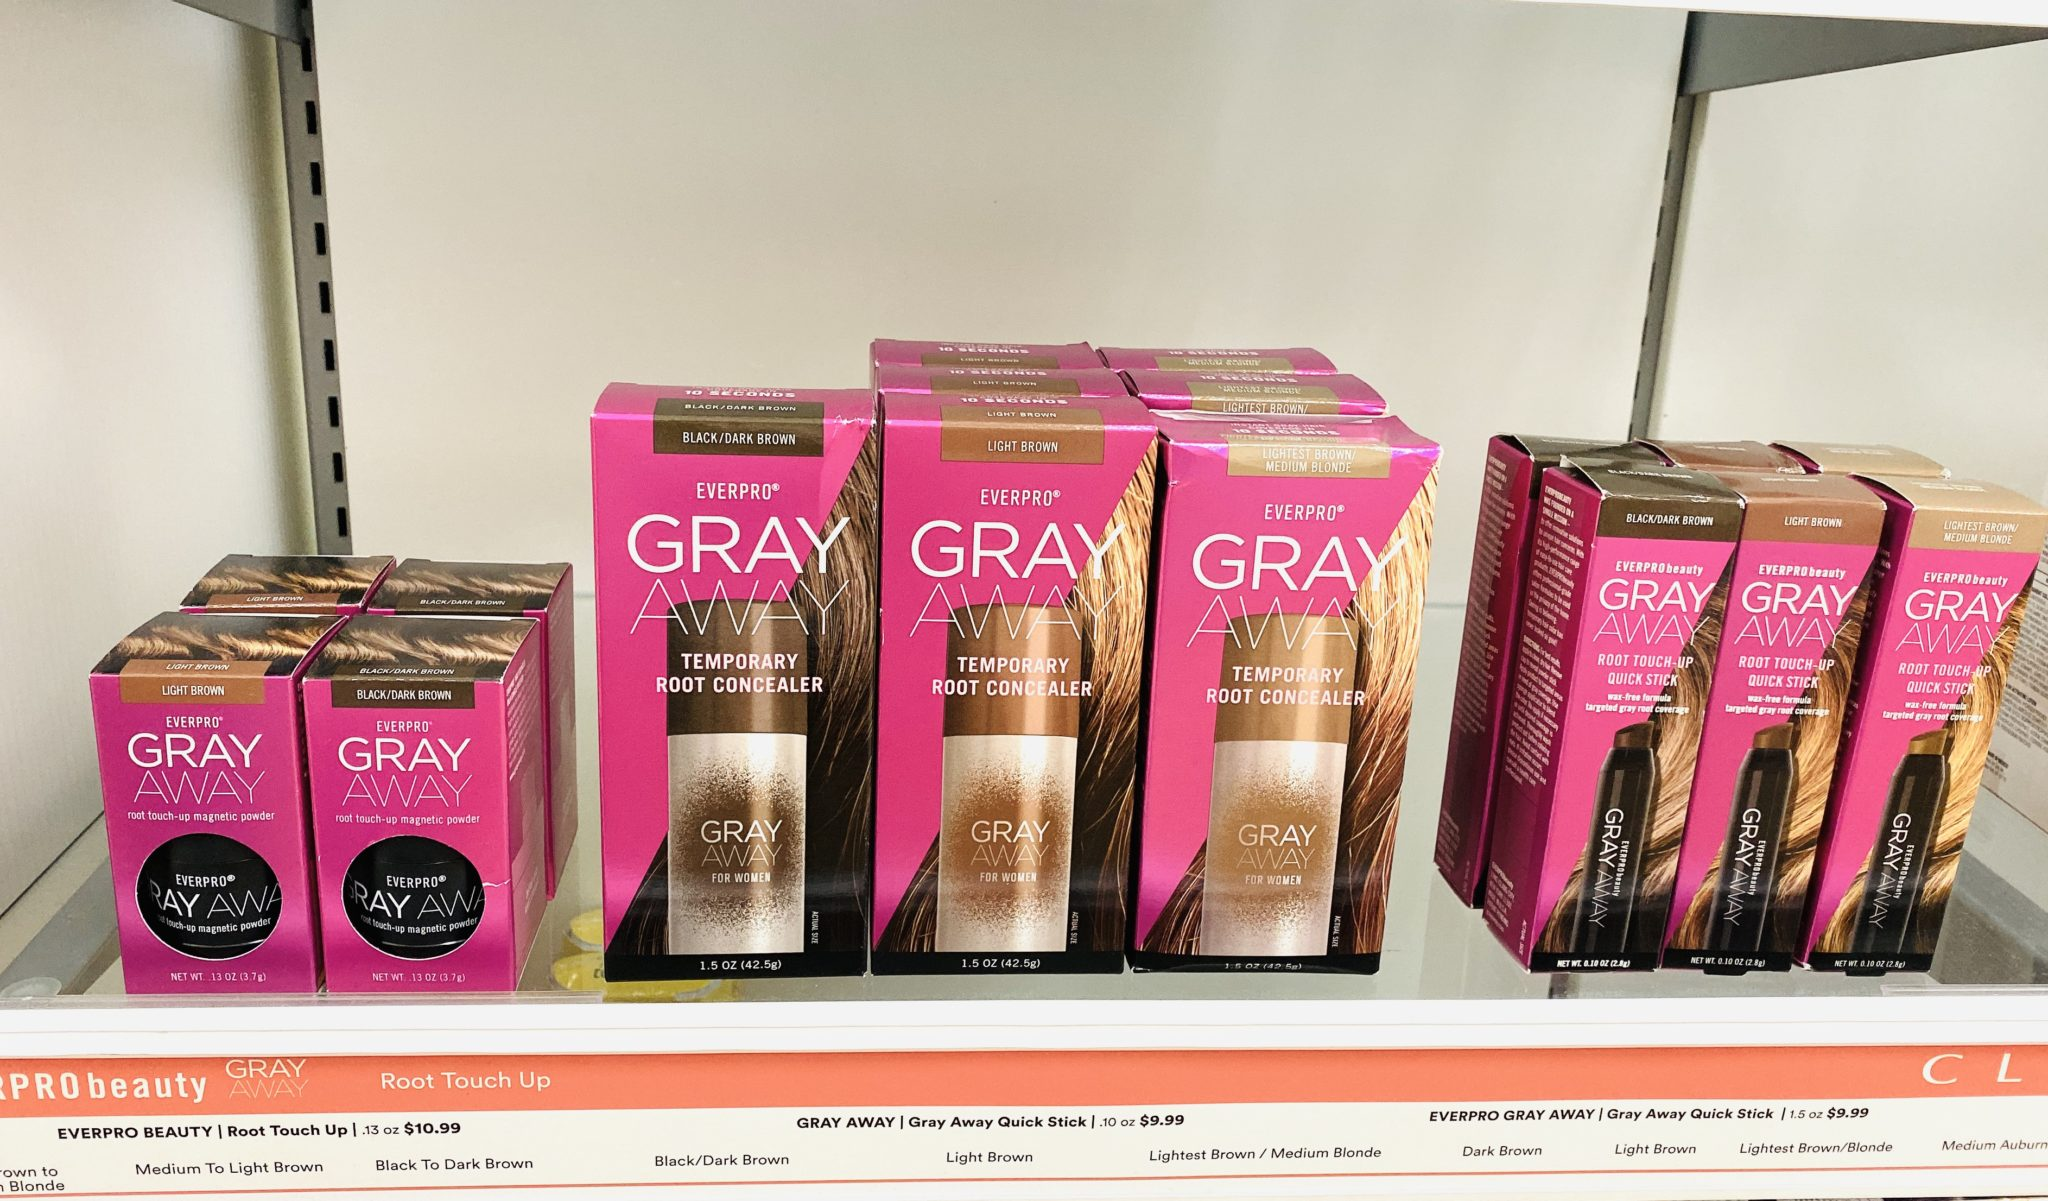 Gray Away at ULTA